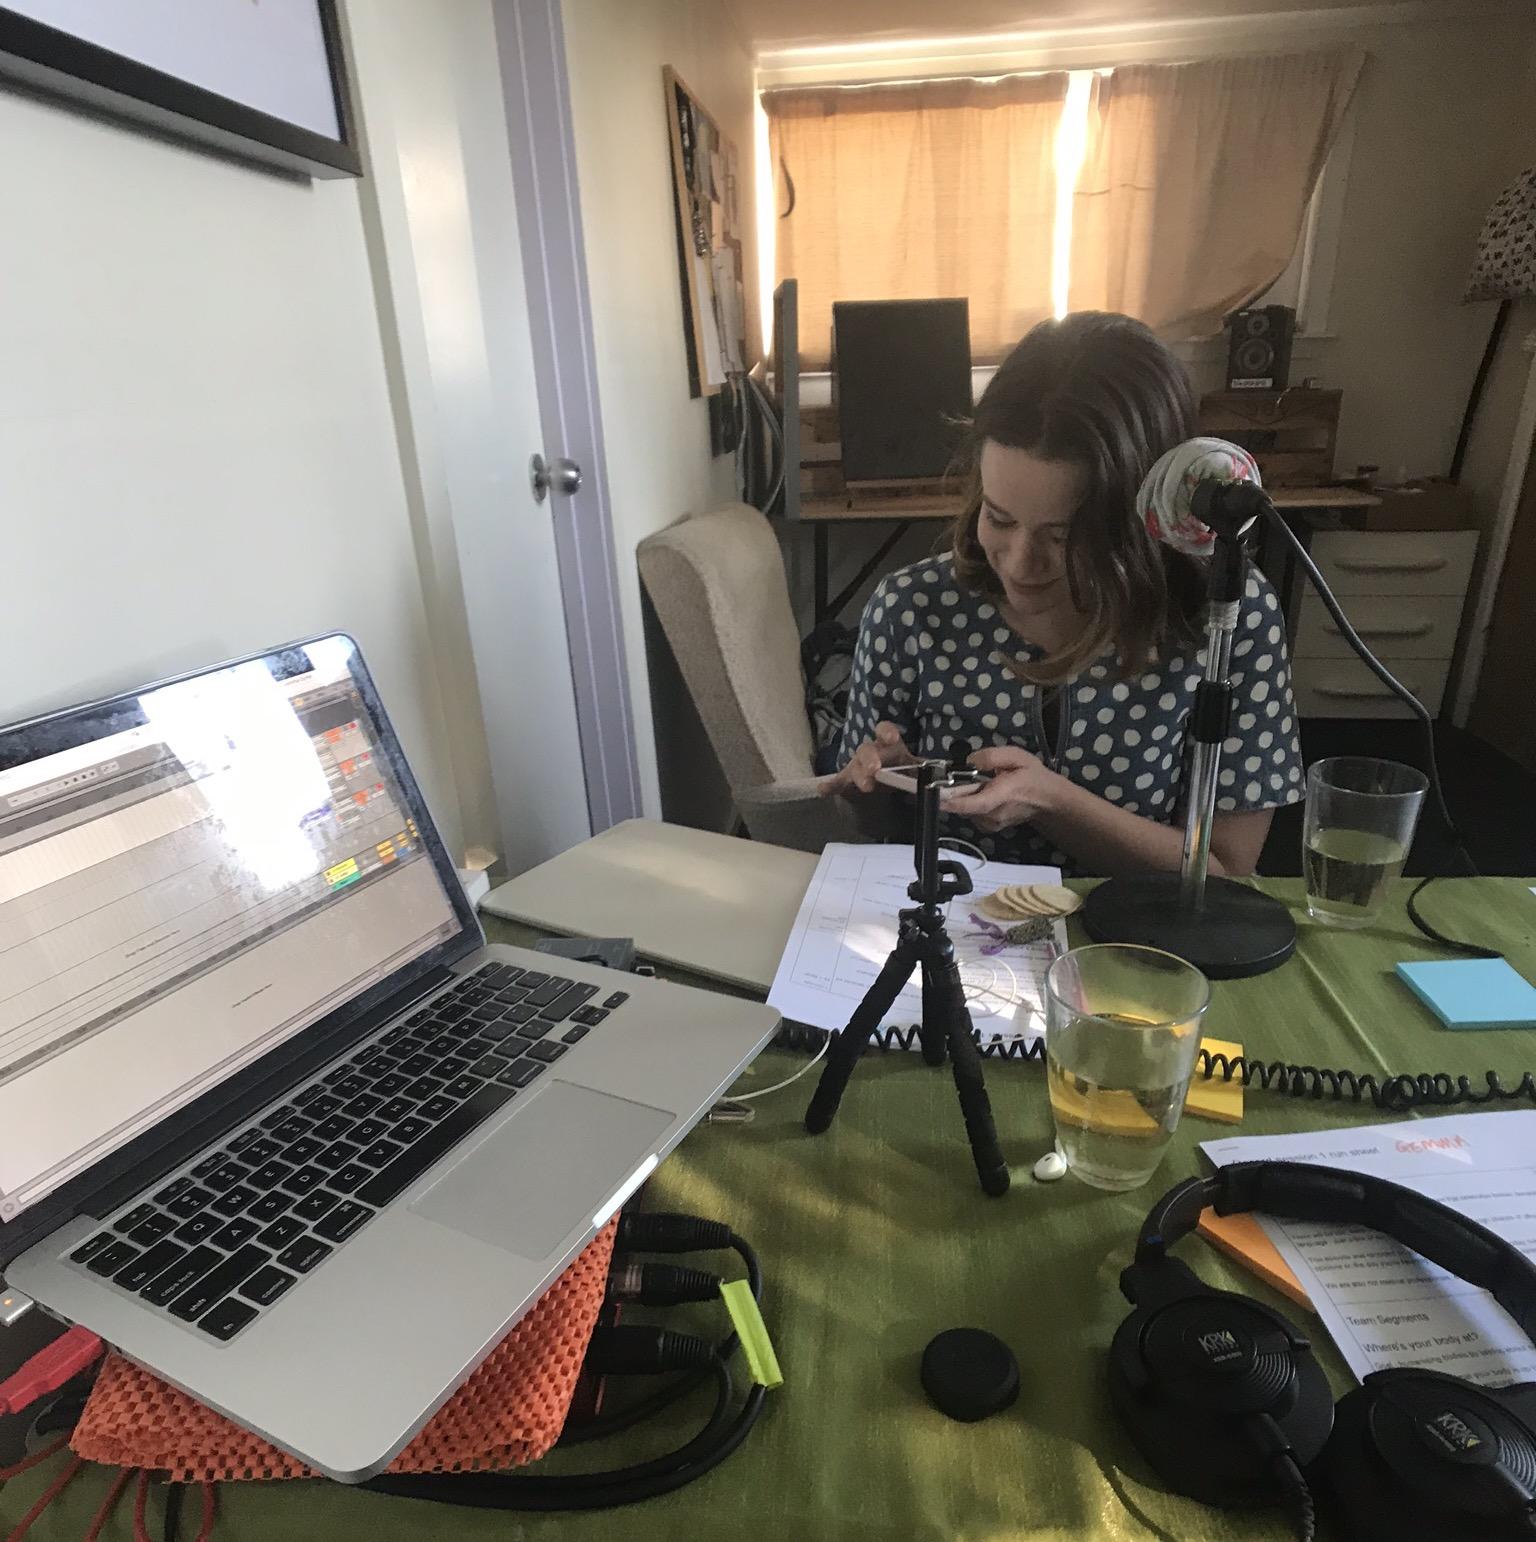 sarah_recording.JPG